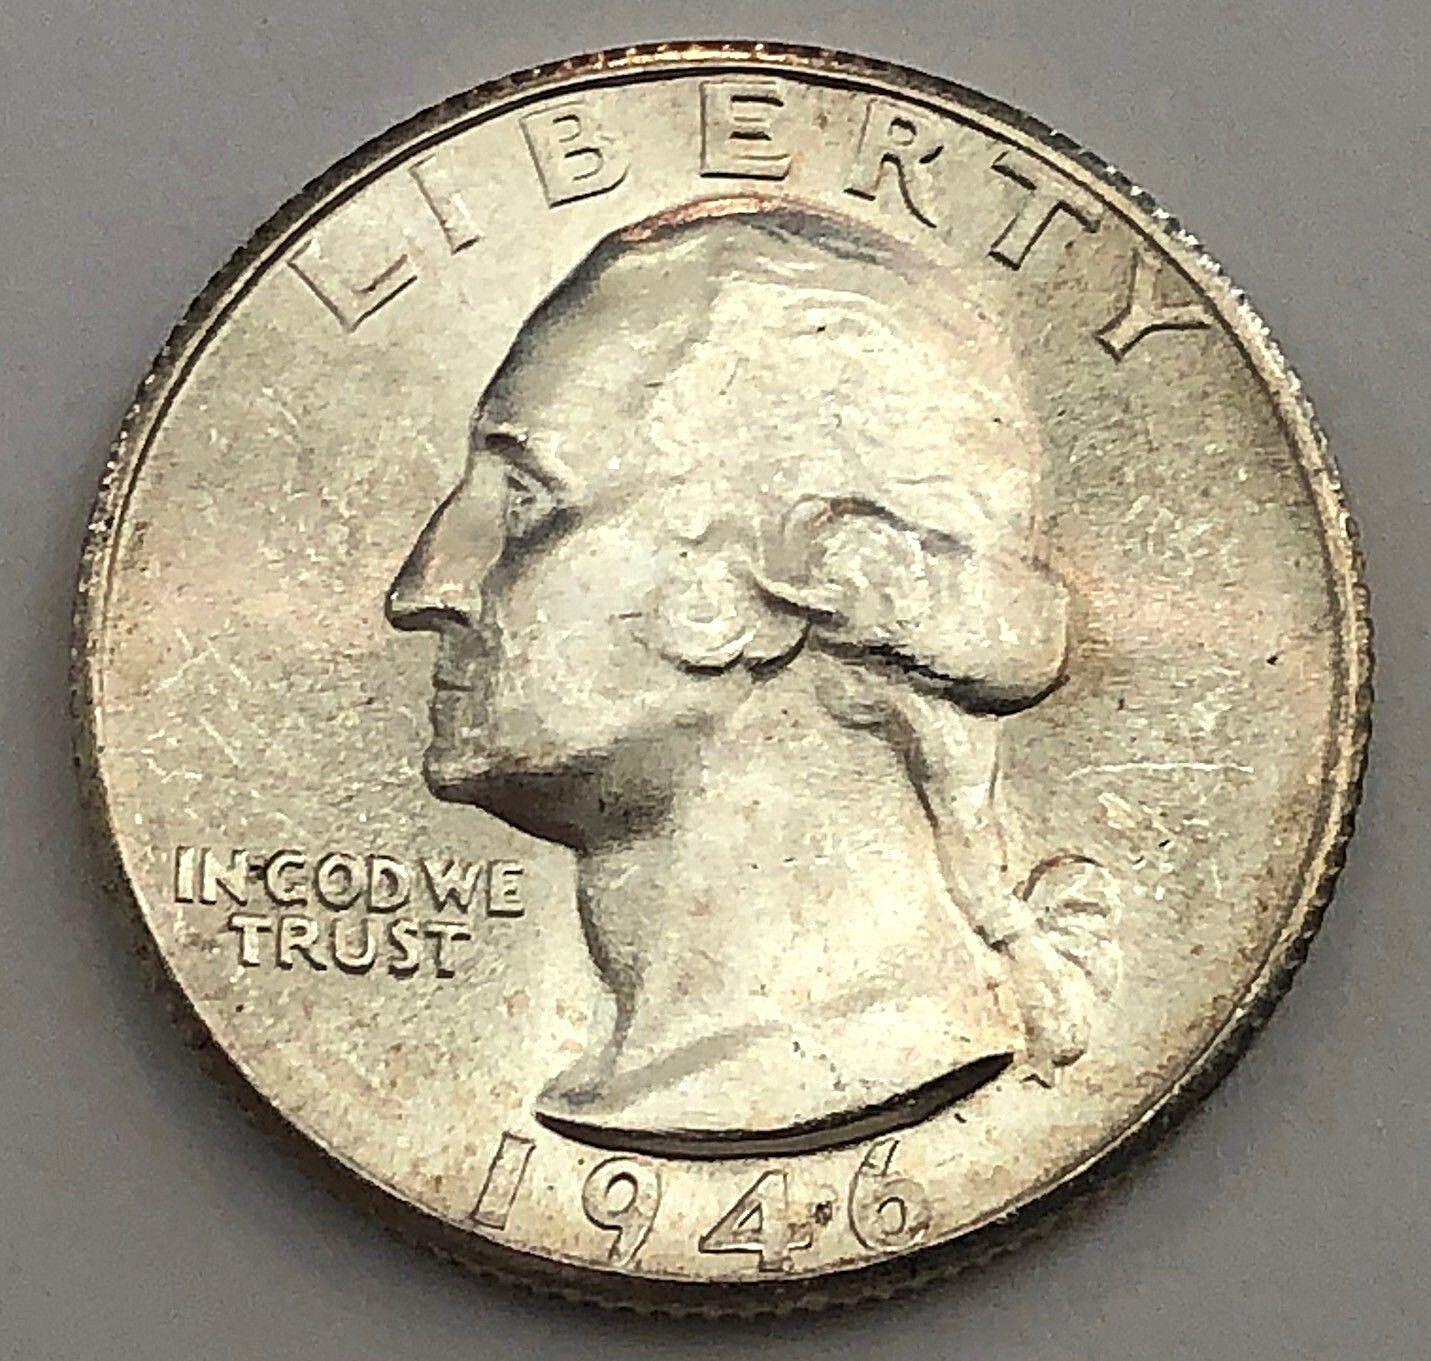 1946-S/S WASHINGTON SILVER QUARTER IN HIGH GRADE - FREE SHIPPING  - $14.95